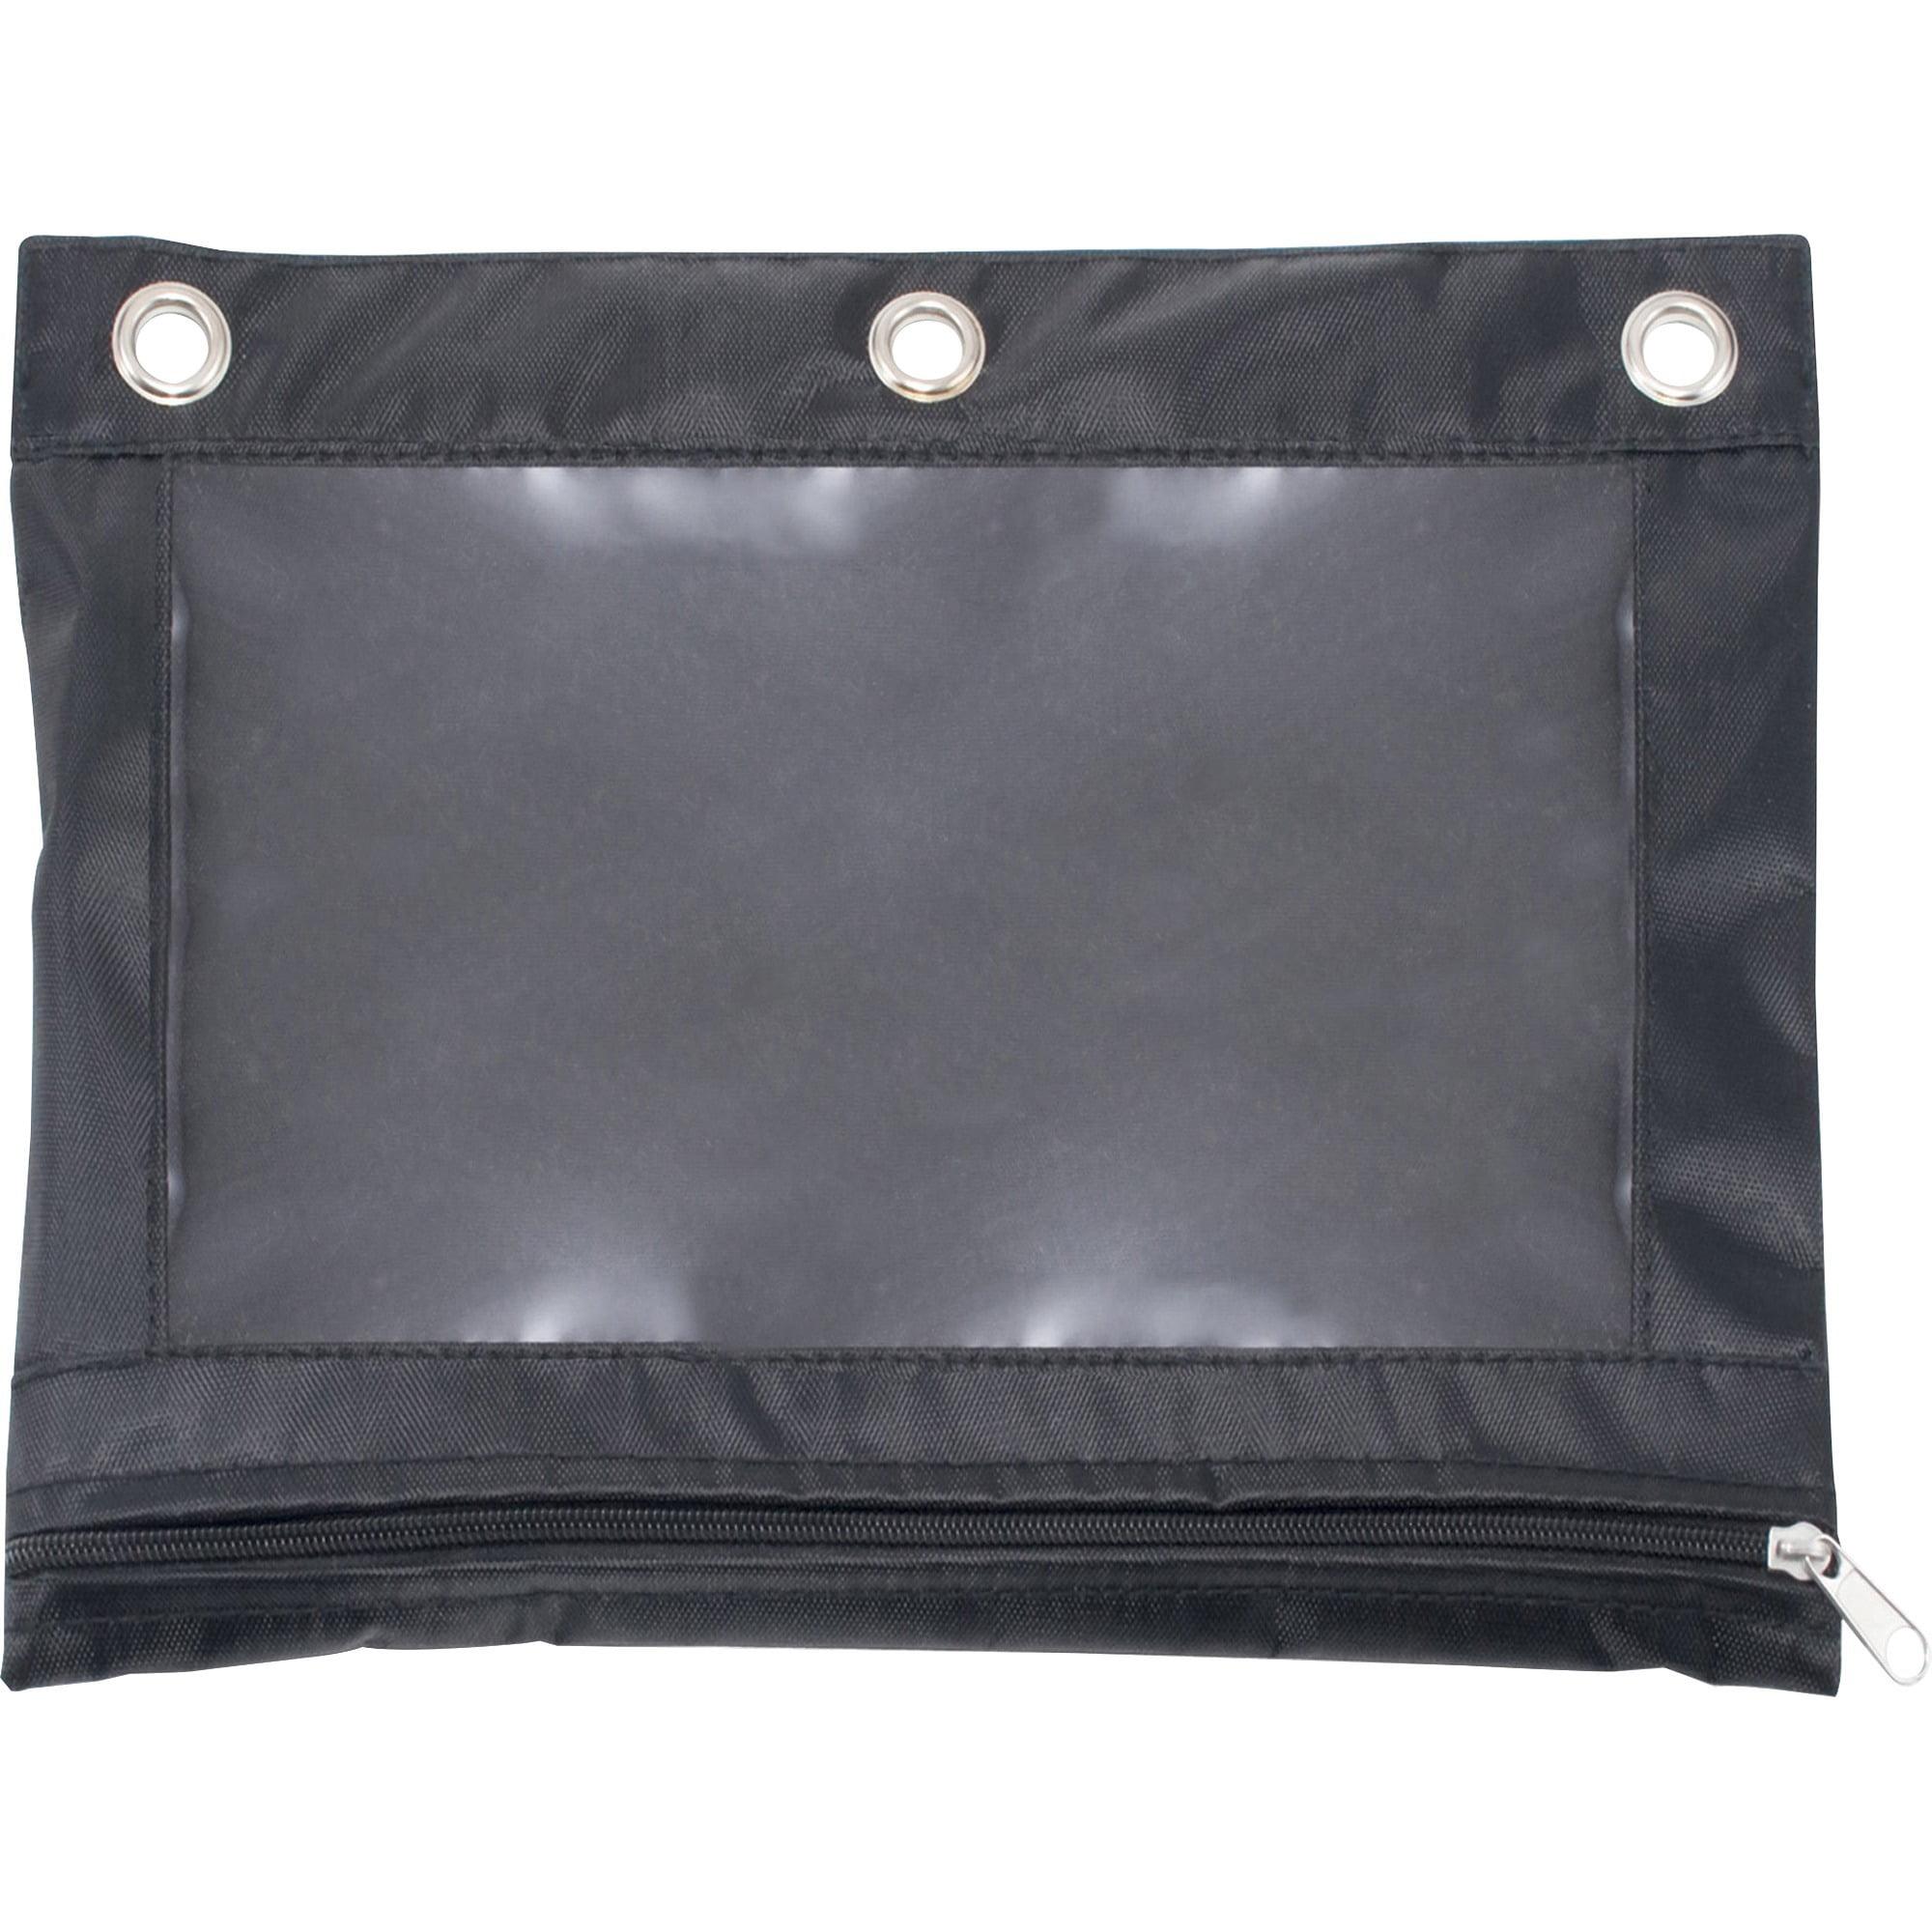 Advantus Binder Pencil Pouch, 10 x 7 3/8, Black/Clear